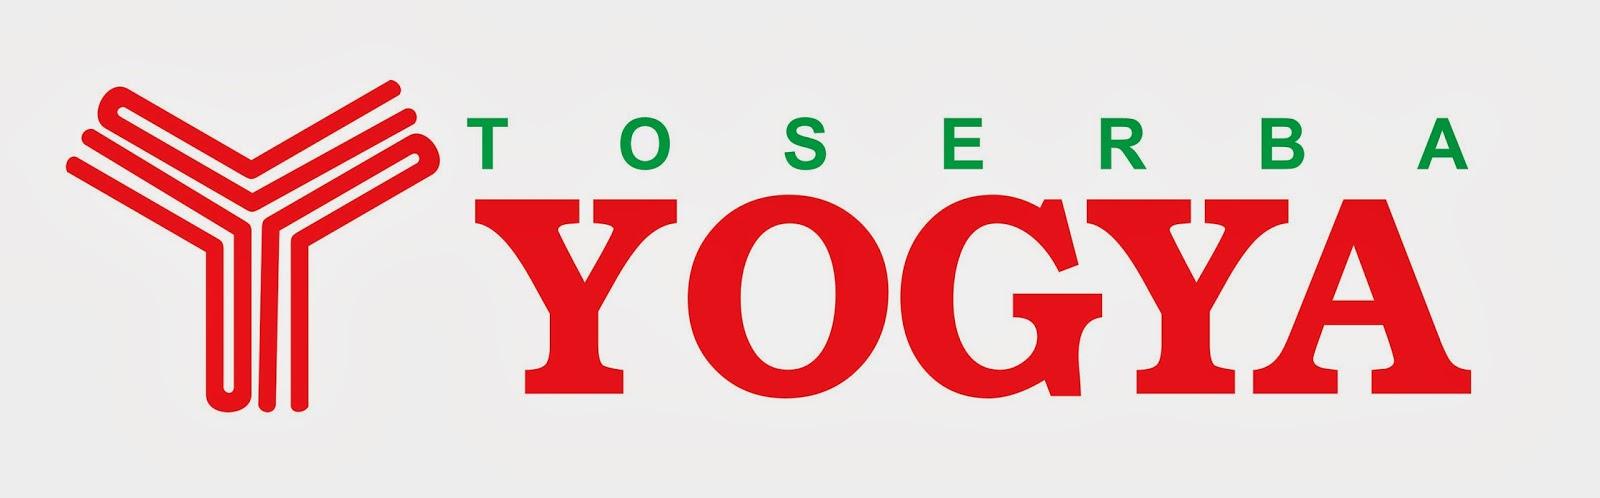 logo yogya toserba